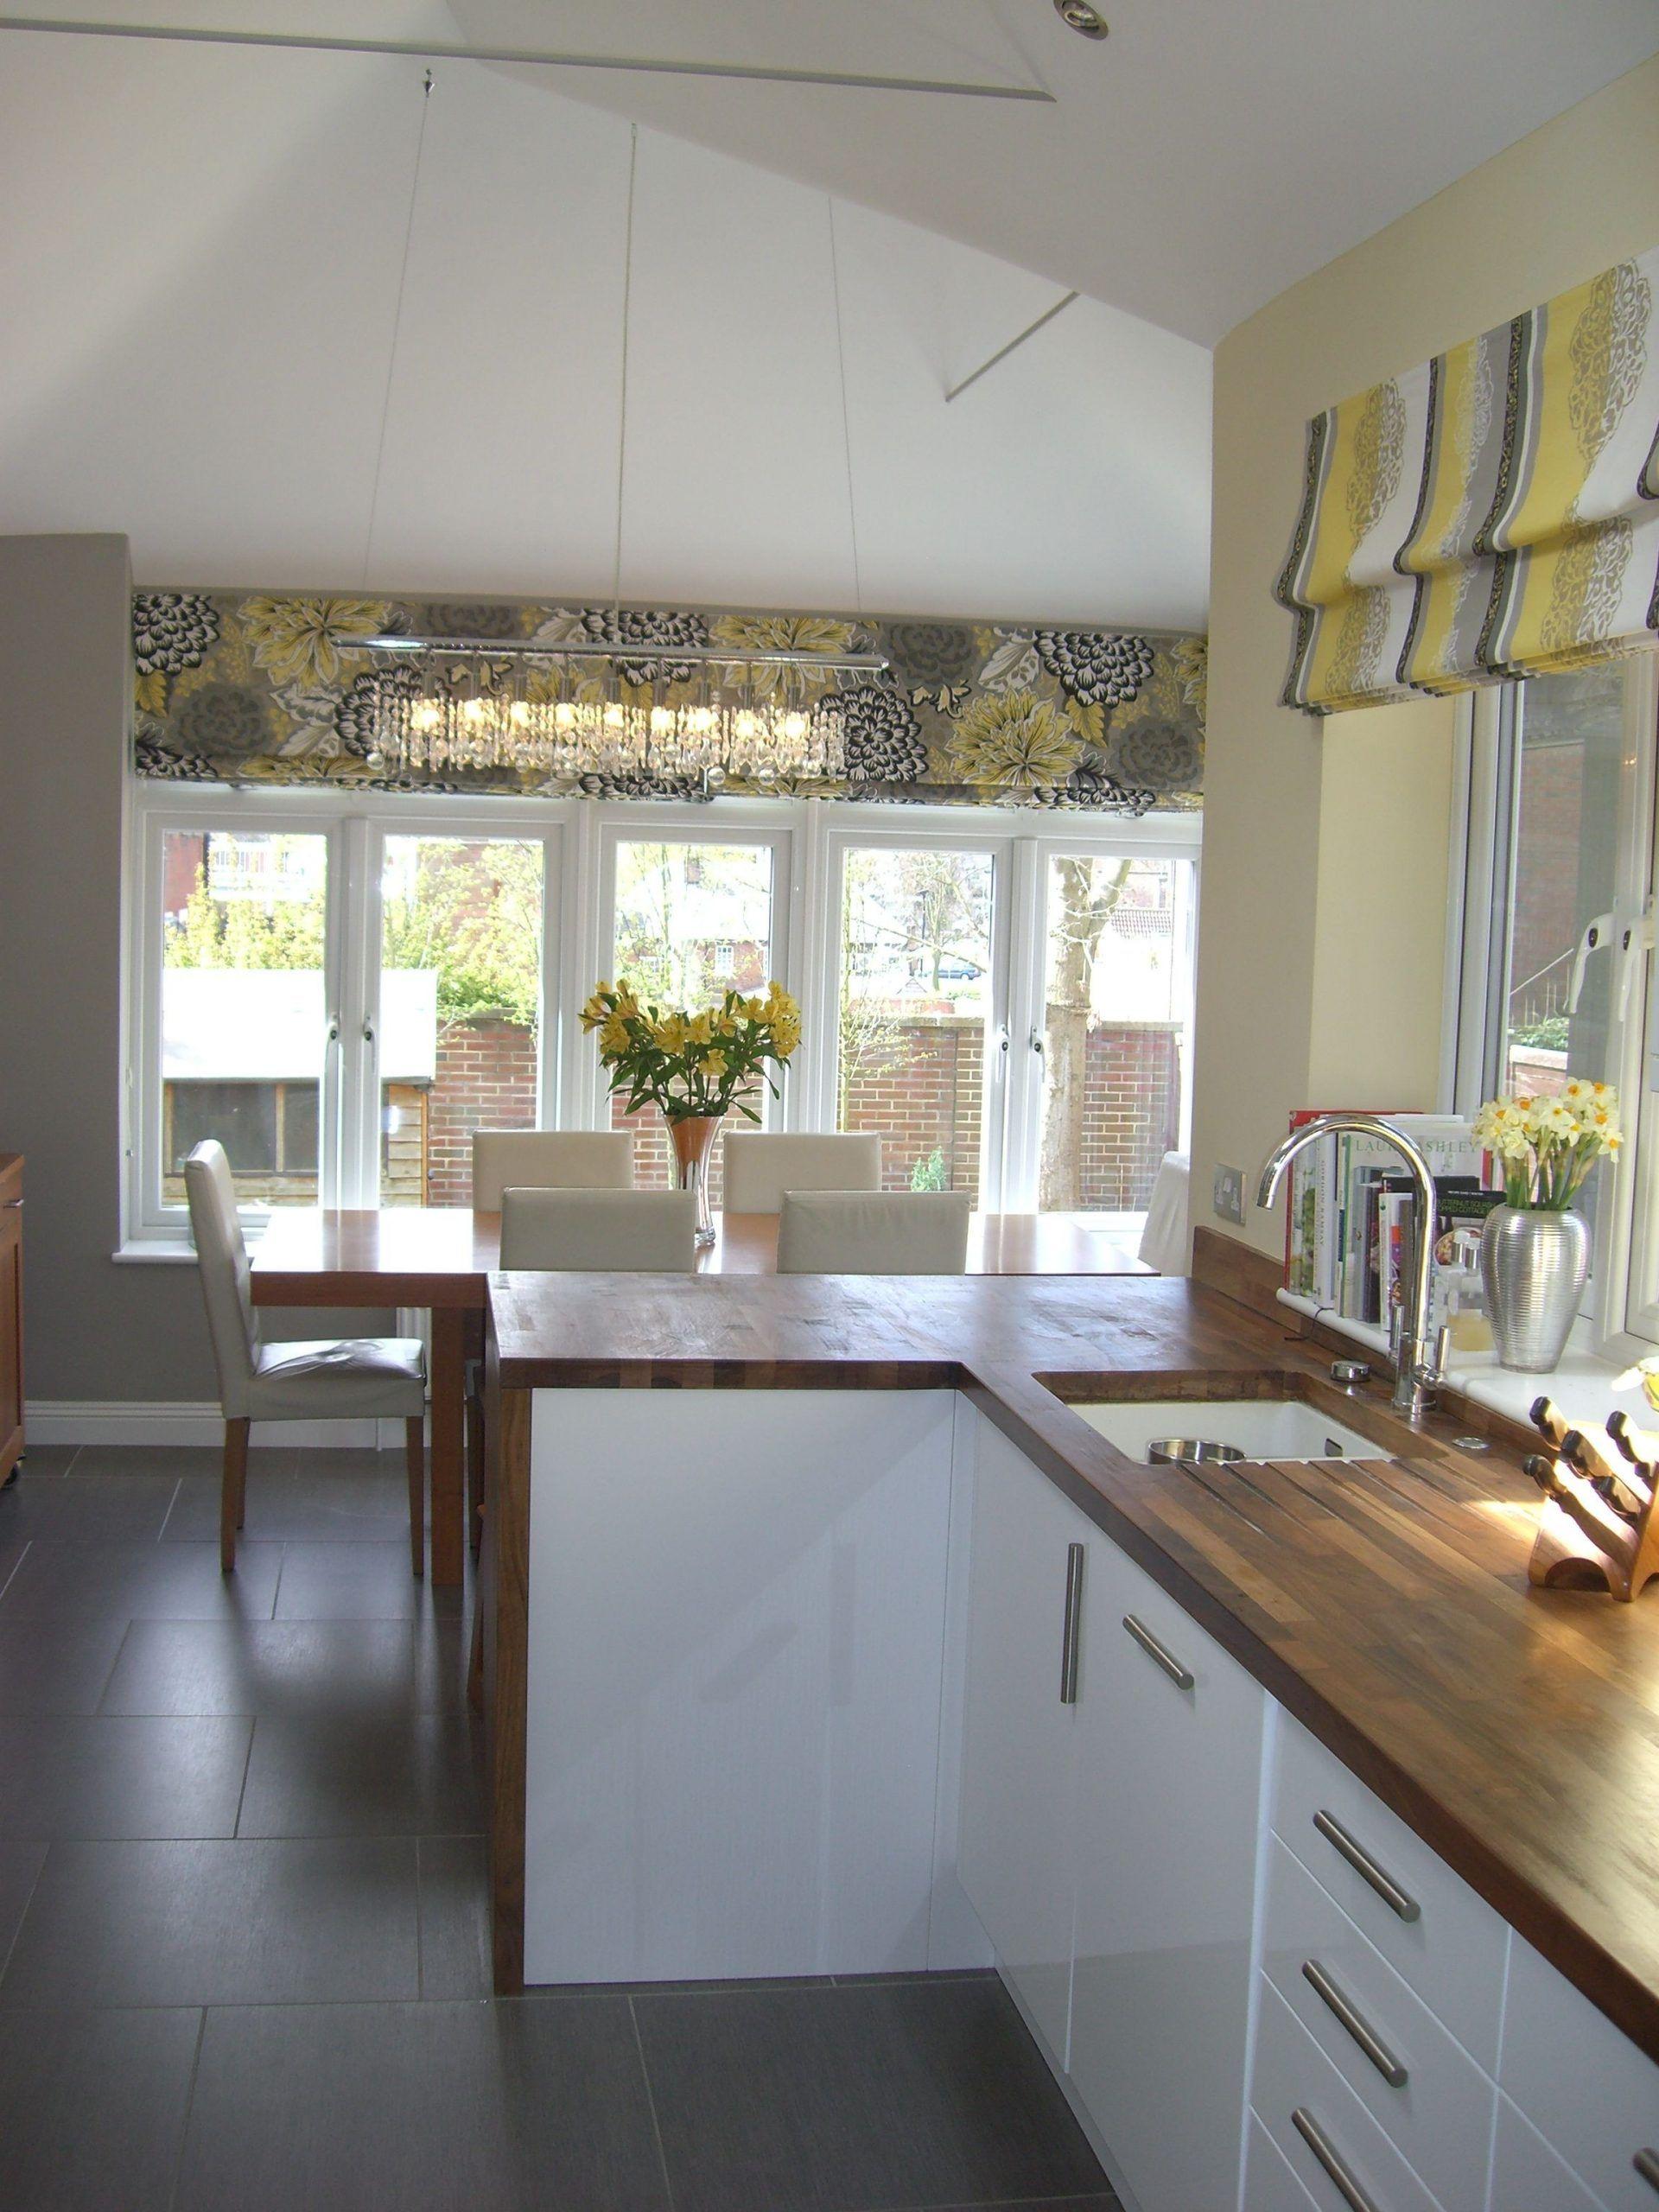 Kitchen Week A Burst Of Lemon Yellow Adds Zest To A Dark Grey Kitchen Cococozy Yellow Kitchen Accents Painted Kitchen Floors Kitchen Colour Schemes